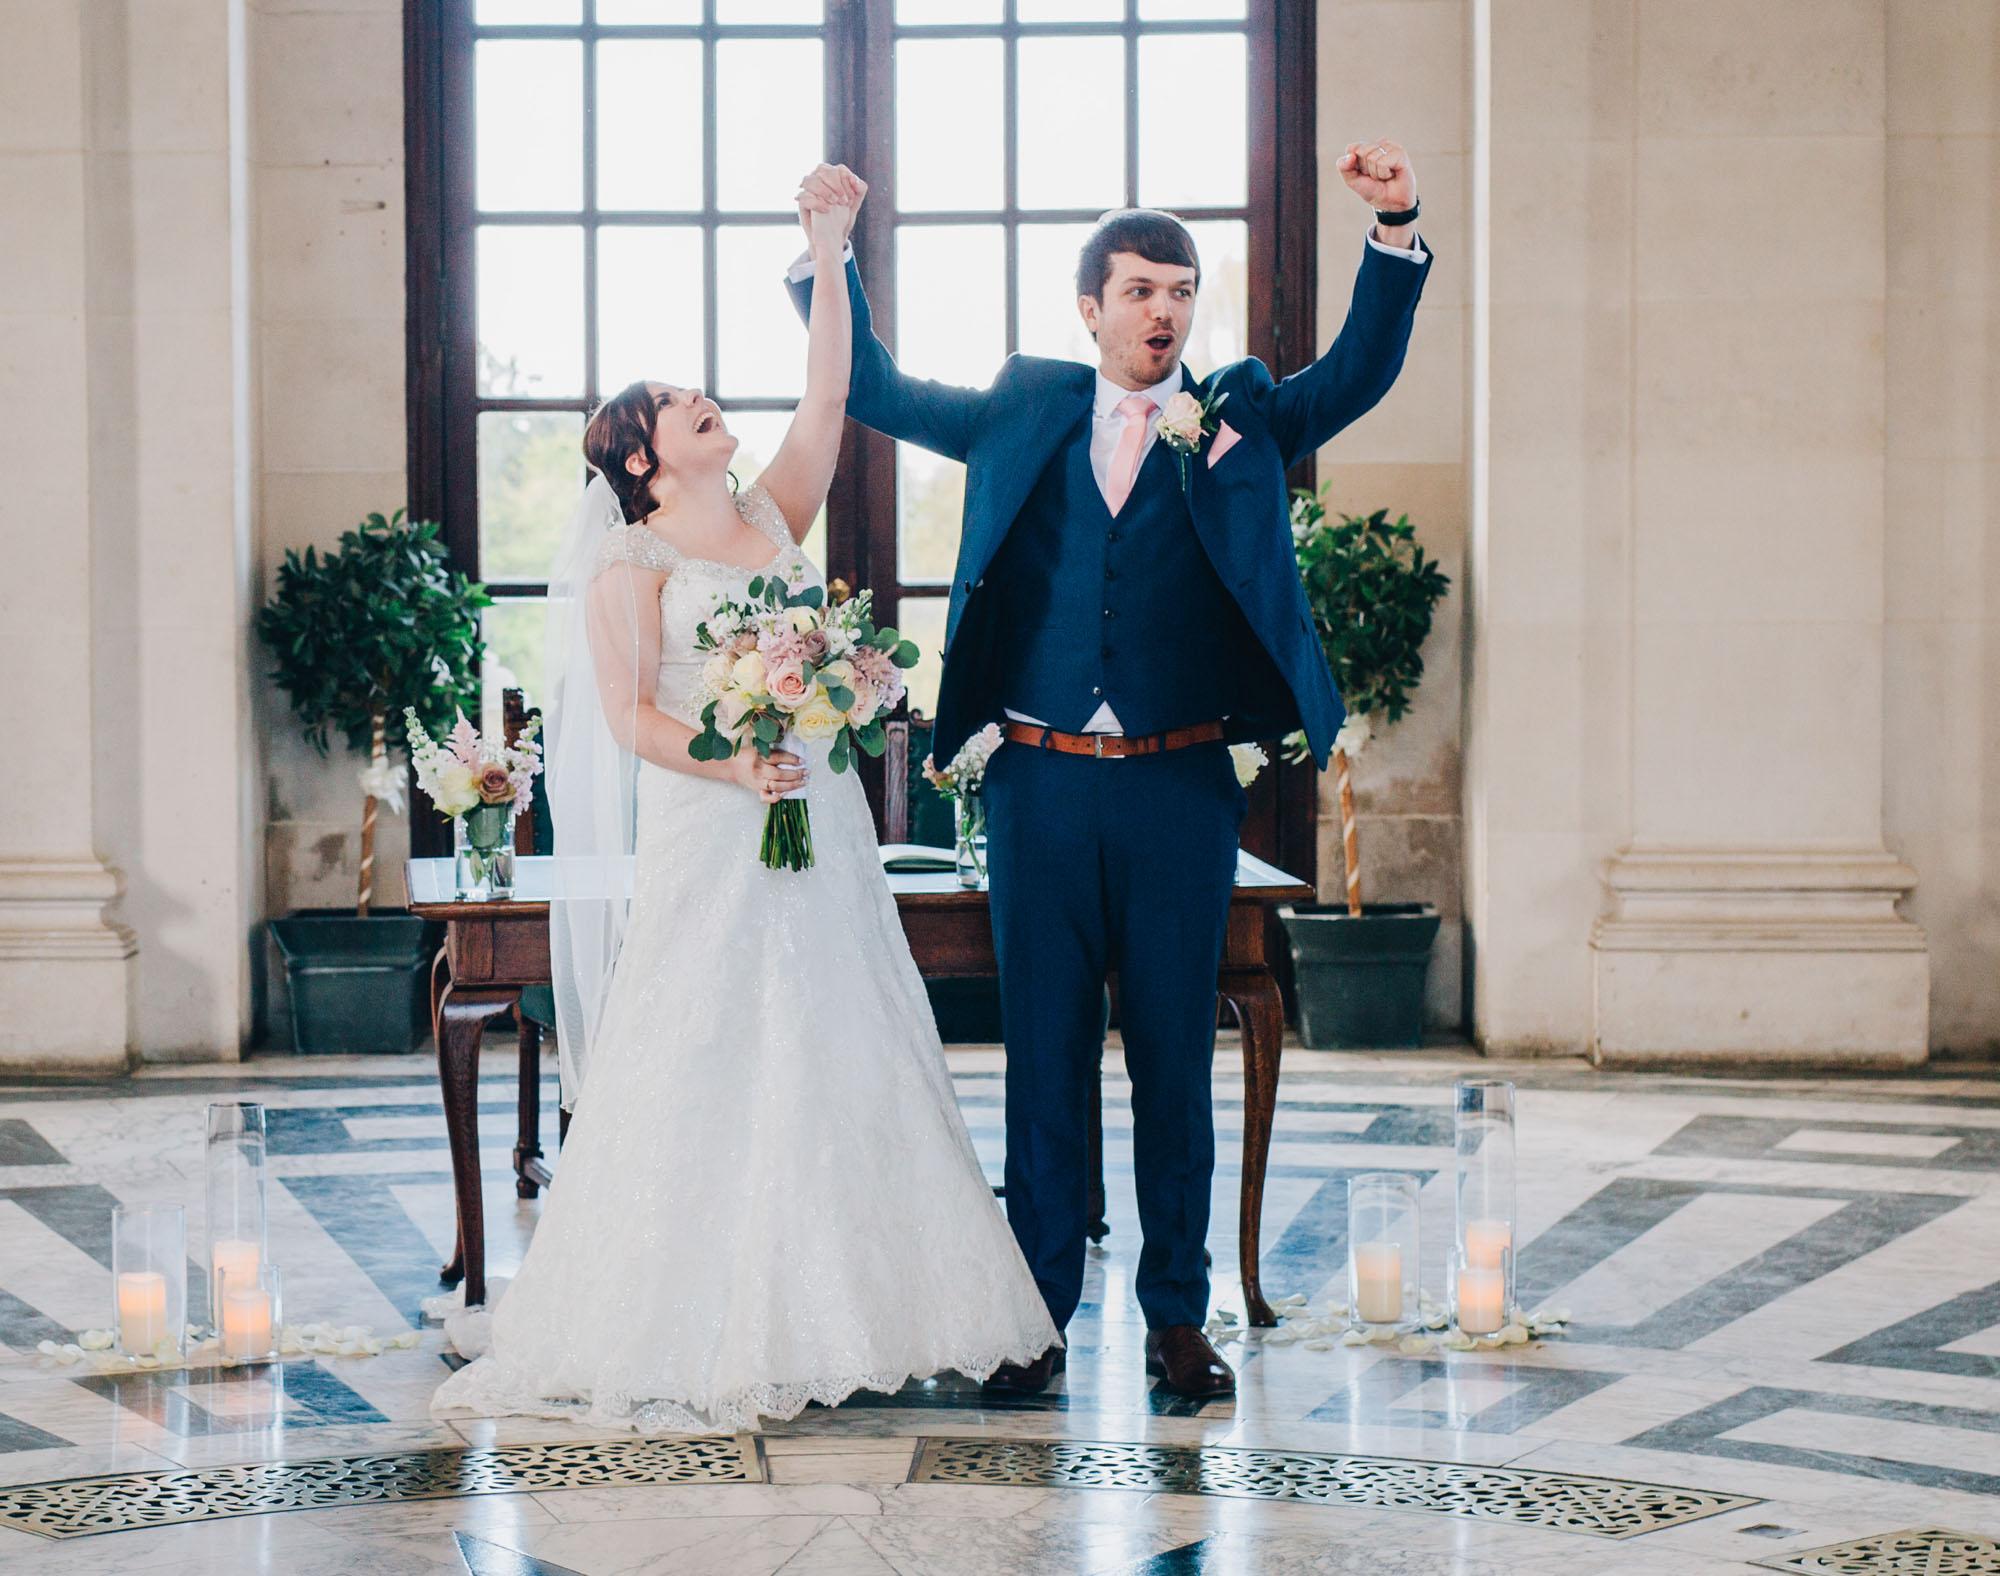 very excited newlyweds - Lancashire wedding photography